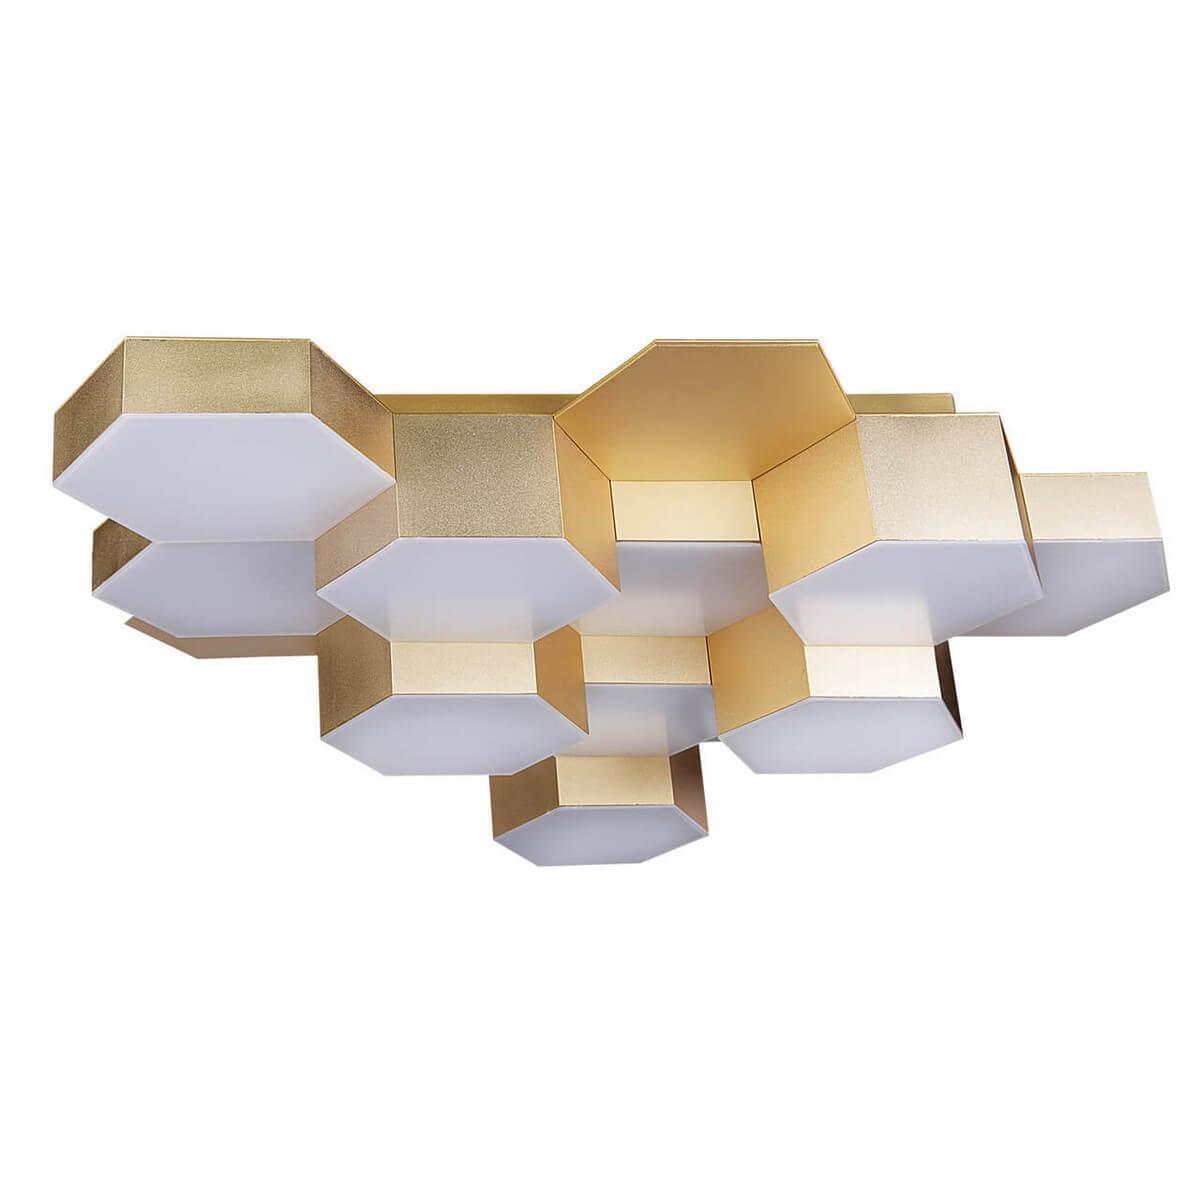 Потолочный светильник Lightstar 750123, LED, 60 Вт lightstar 214316